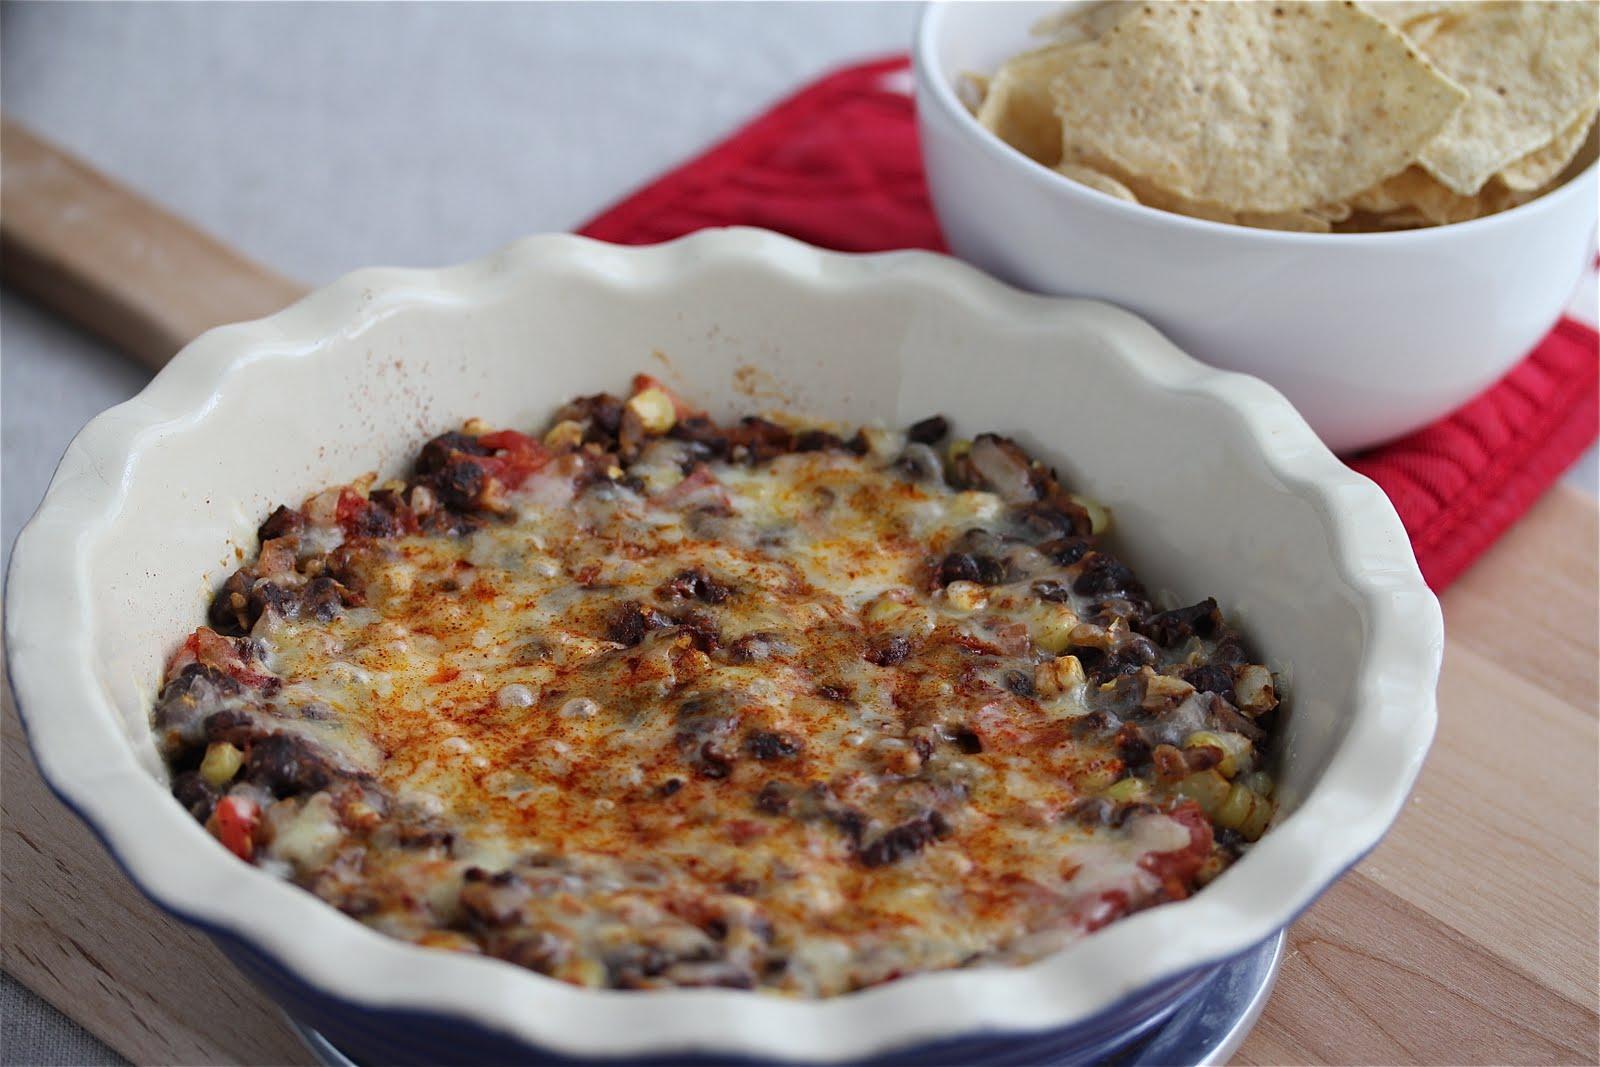 Easy Hot Black Bean Salsa Dip Recipe - Jeanette's Healthy Living